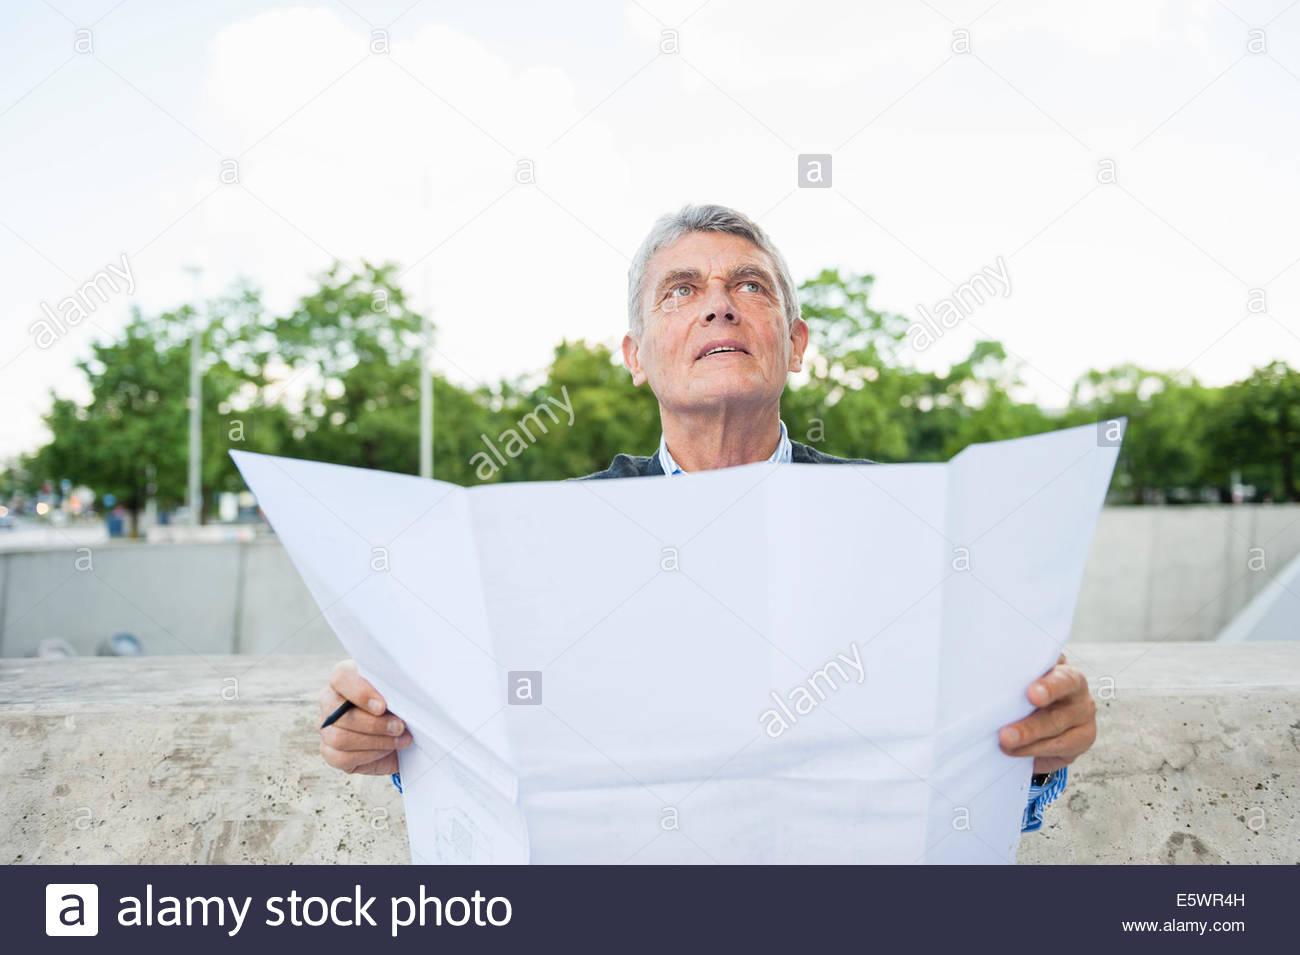 Senior adult businessman holding plans - Stock Image